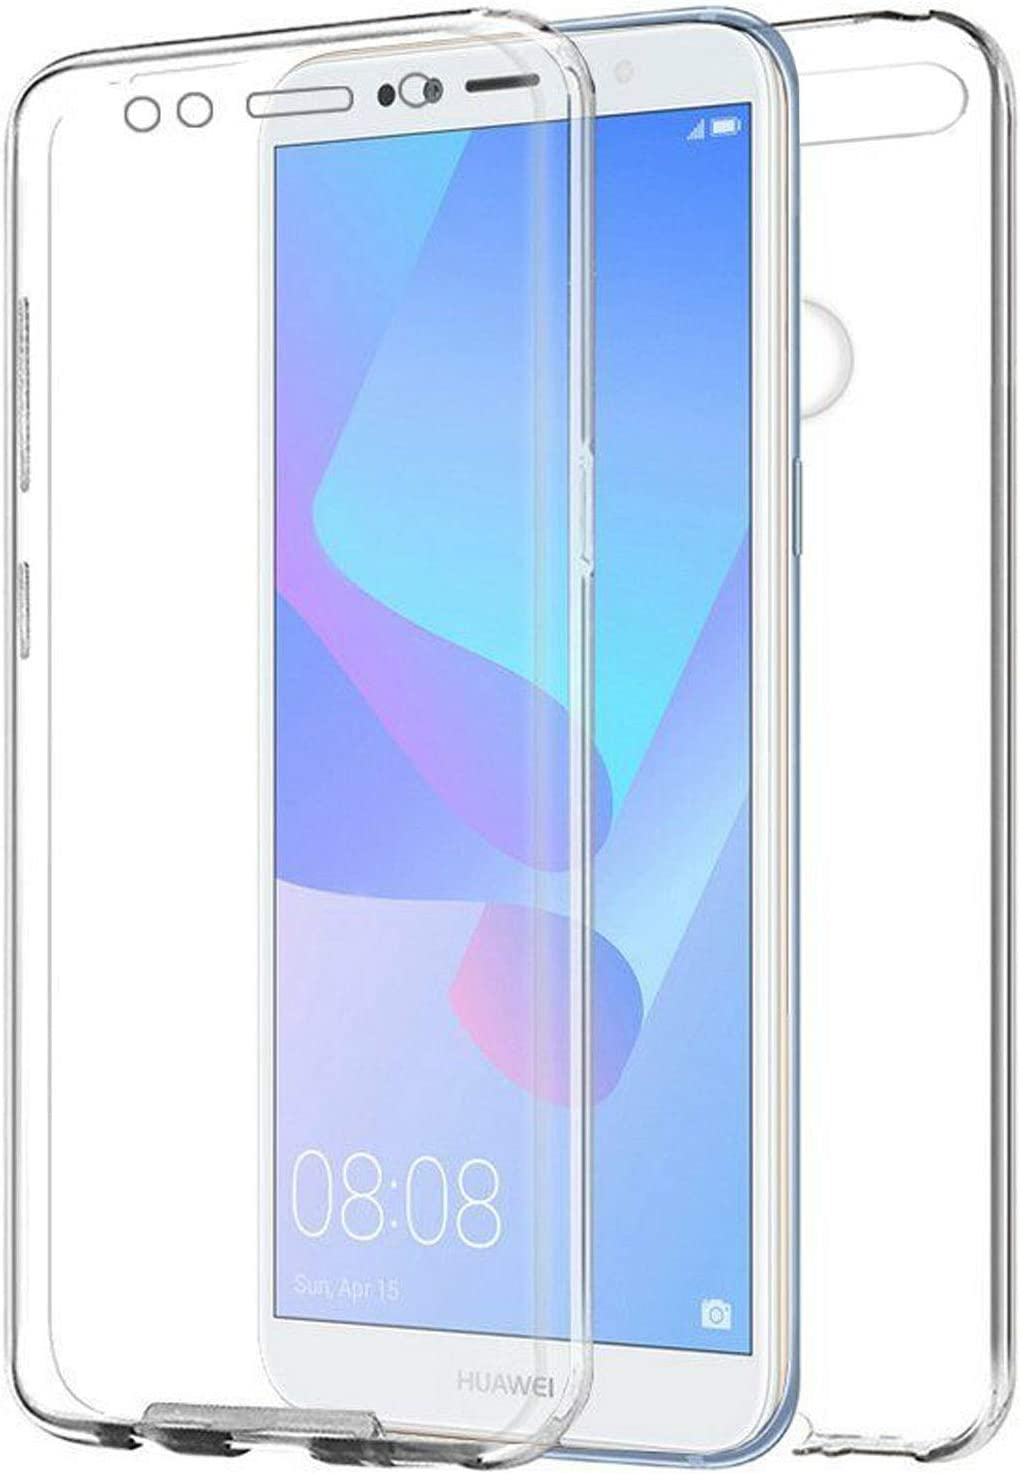 TBOC Funda para Huawei Honor 7A [5.7 Pulgadas]: Amazon.es: Electrónica